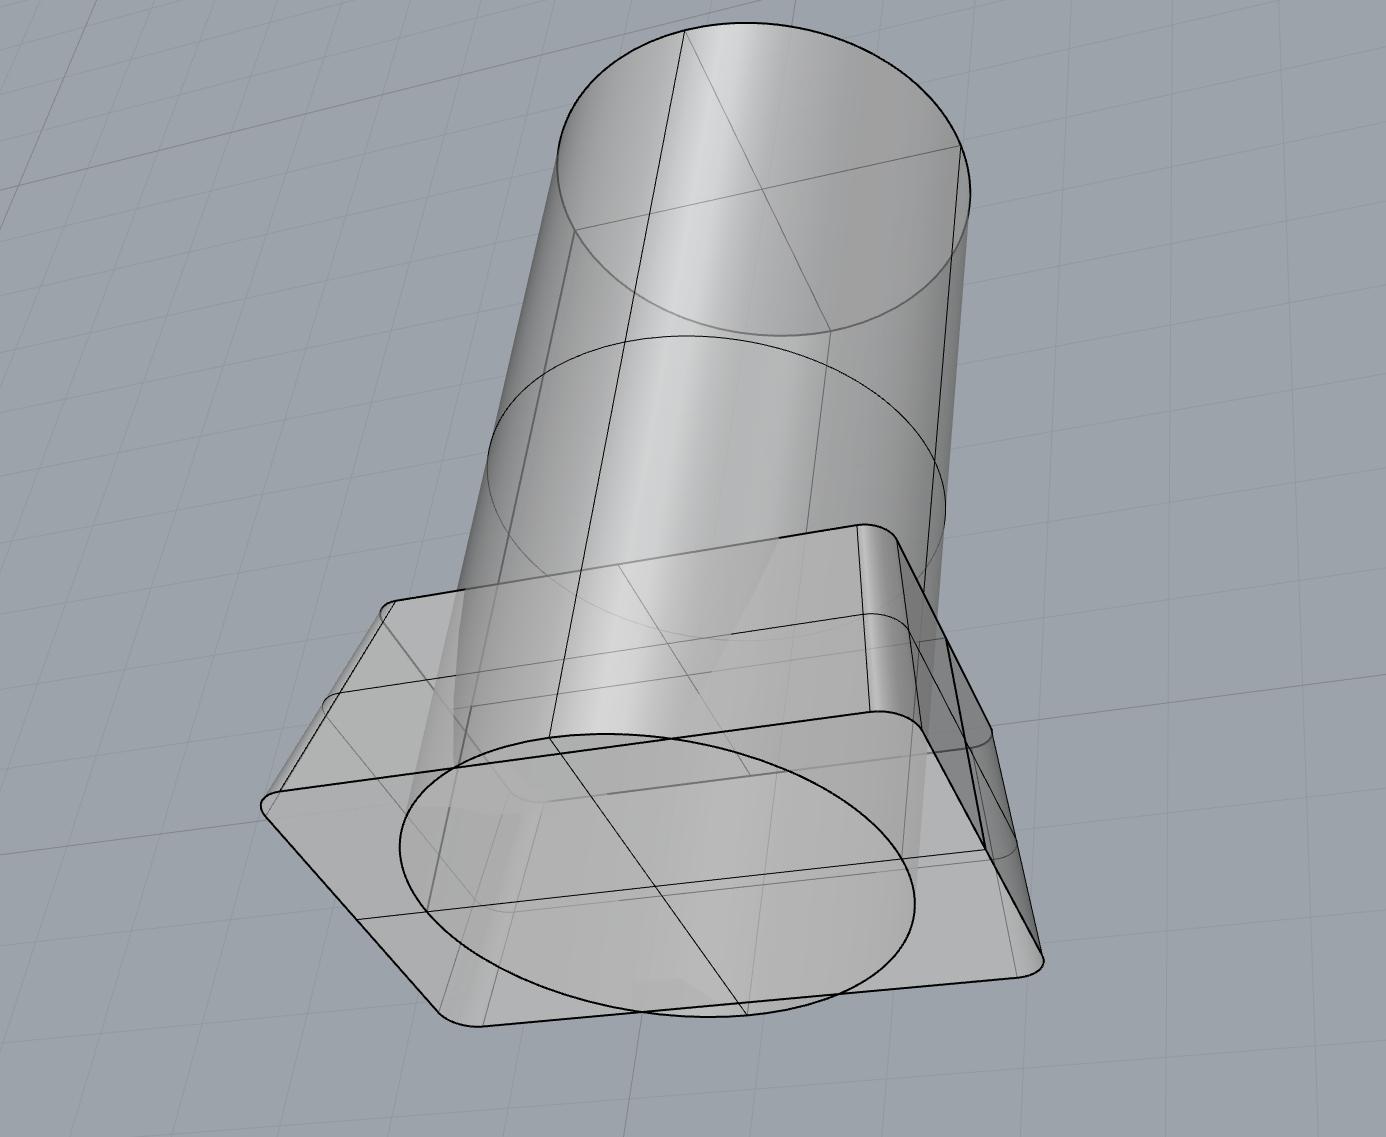 3d_printing_Screenshot_1_11_13_10_32_AM.jpg